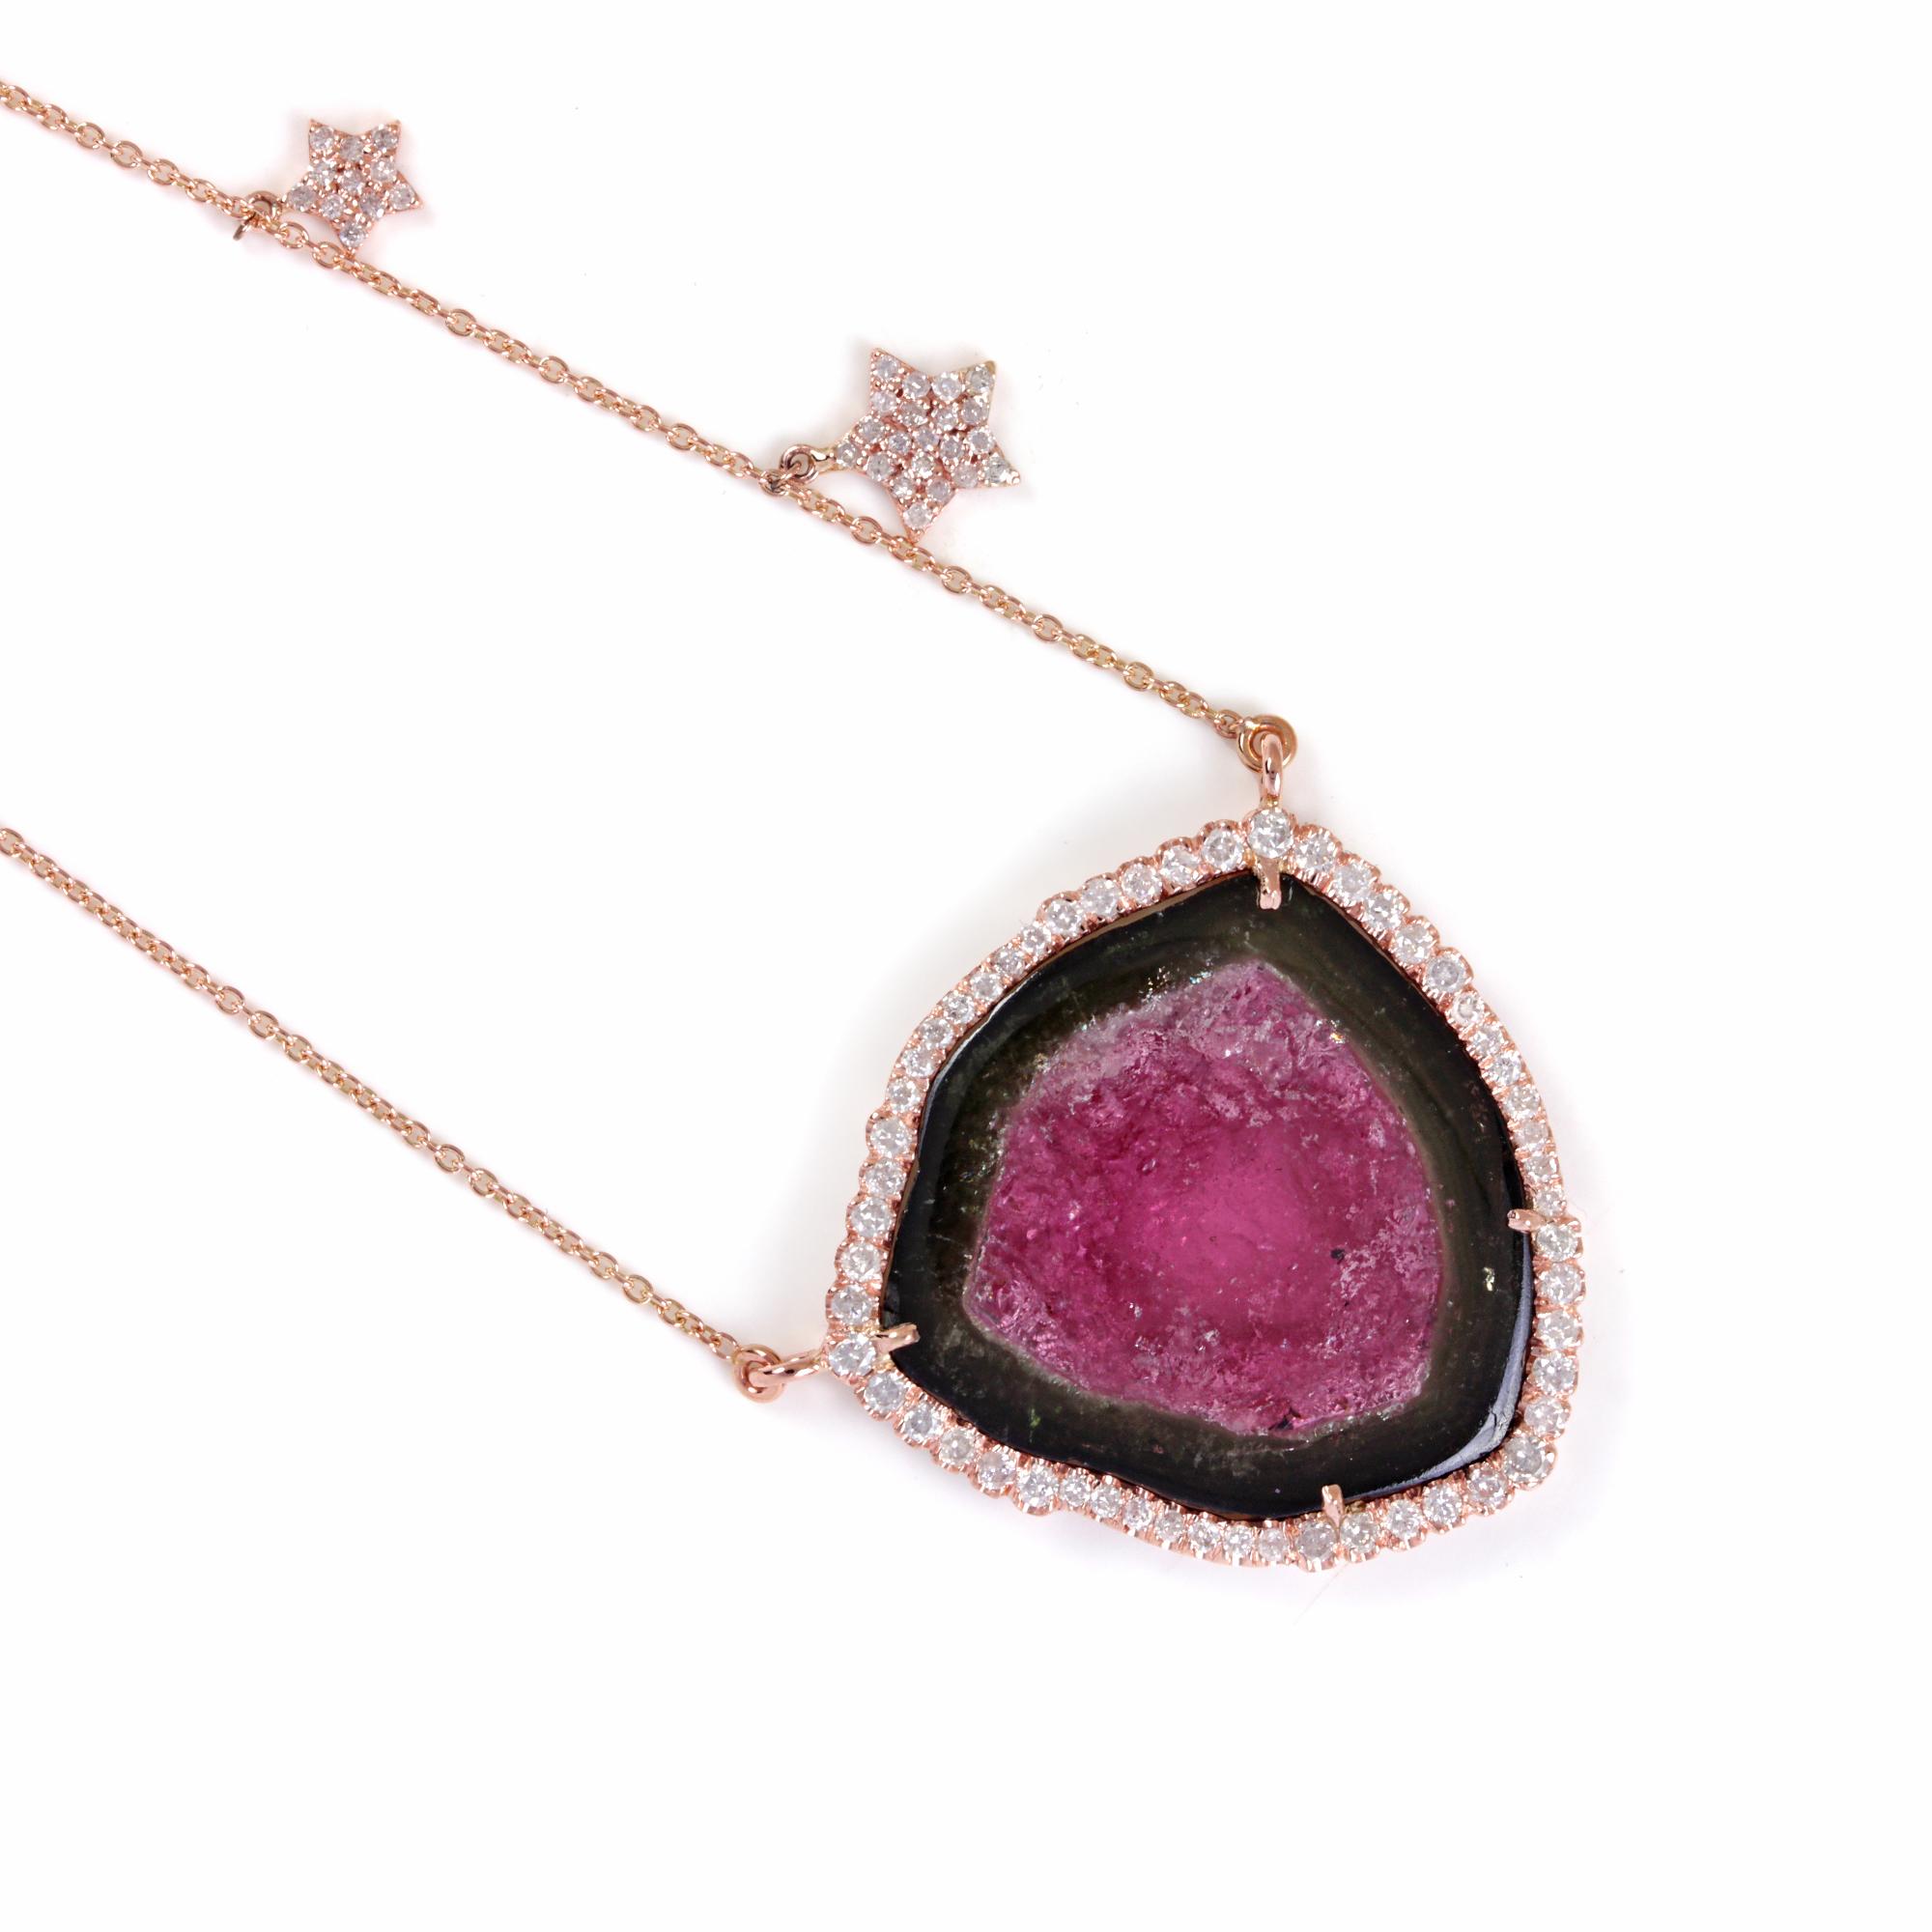 Pink Tourmaline Gemstone 14K Solid Gold Pendant Necklace Pave Diamond Jewelry